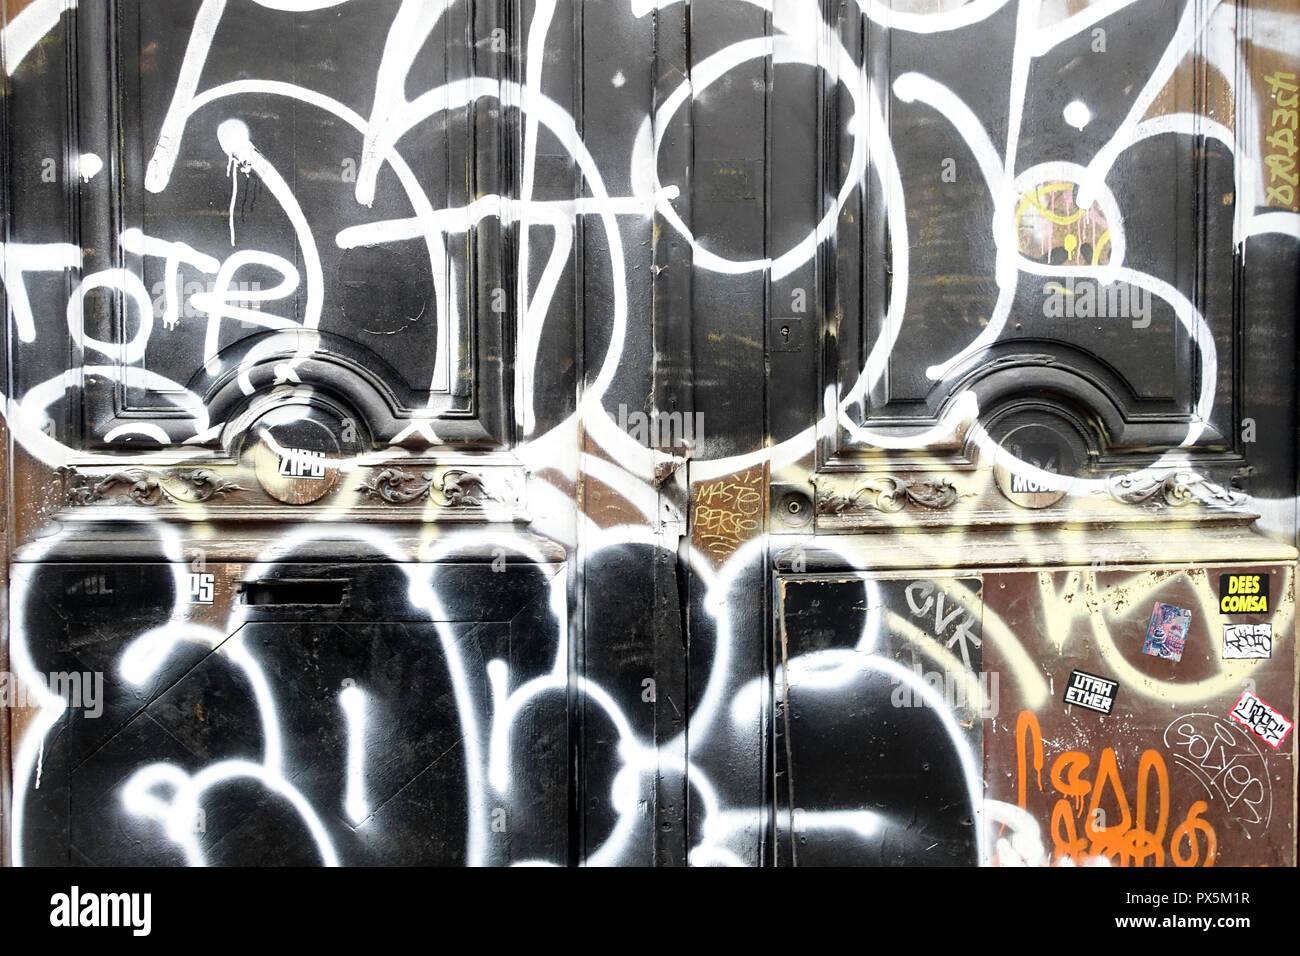 Graffiti on a door.  Paris. France. Stock Photo